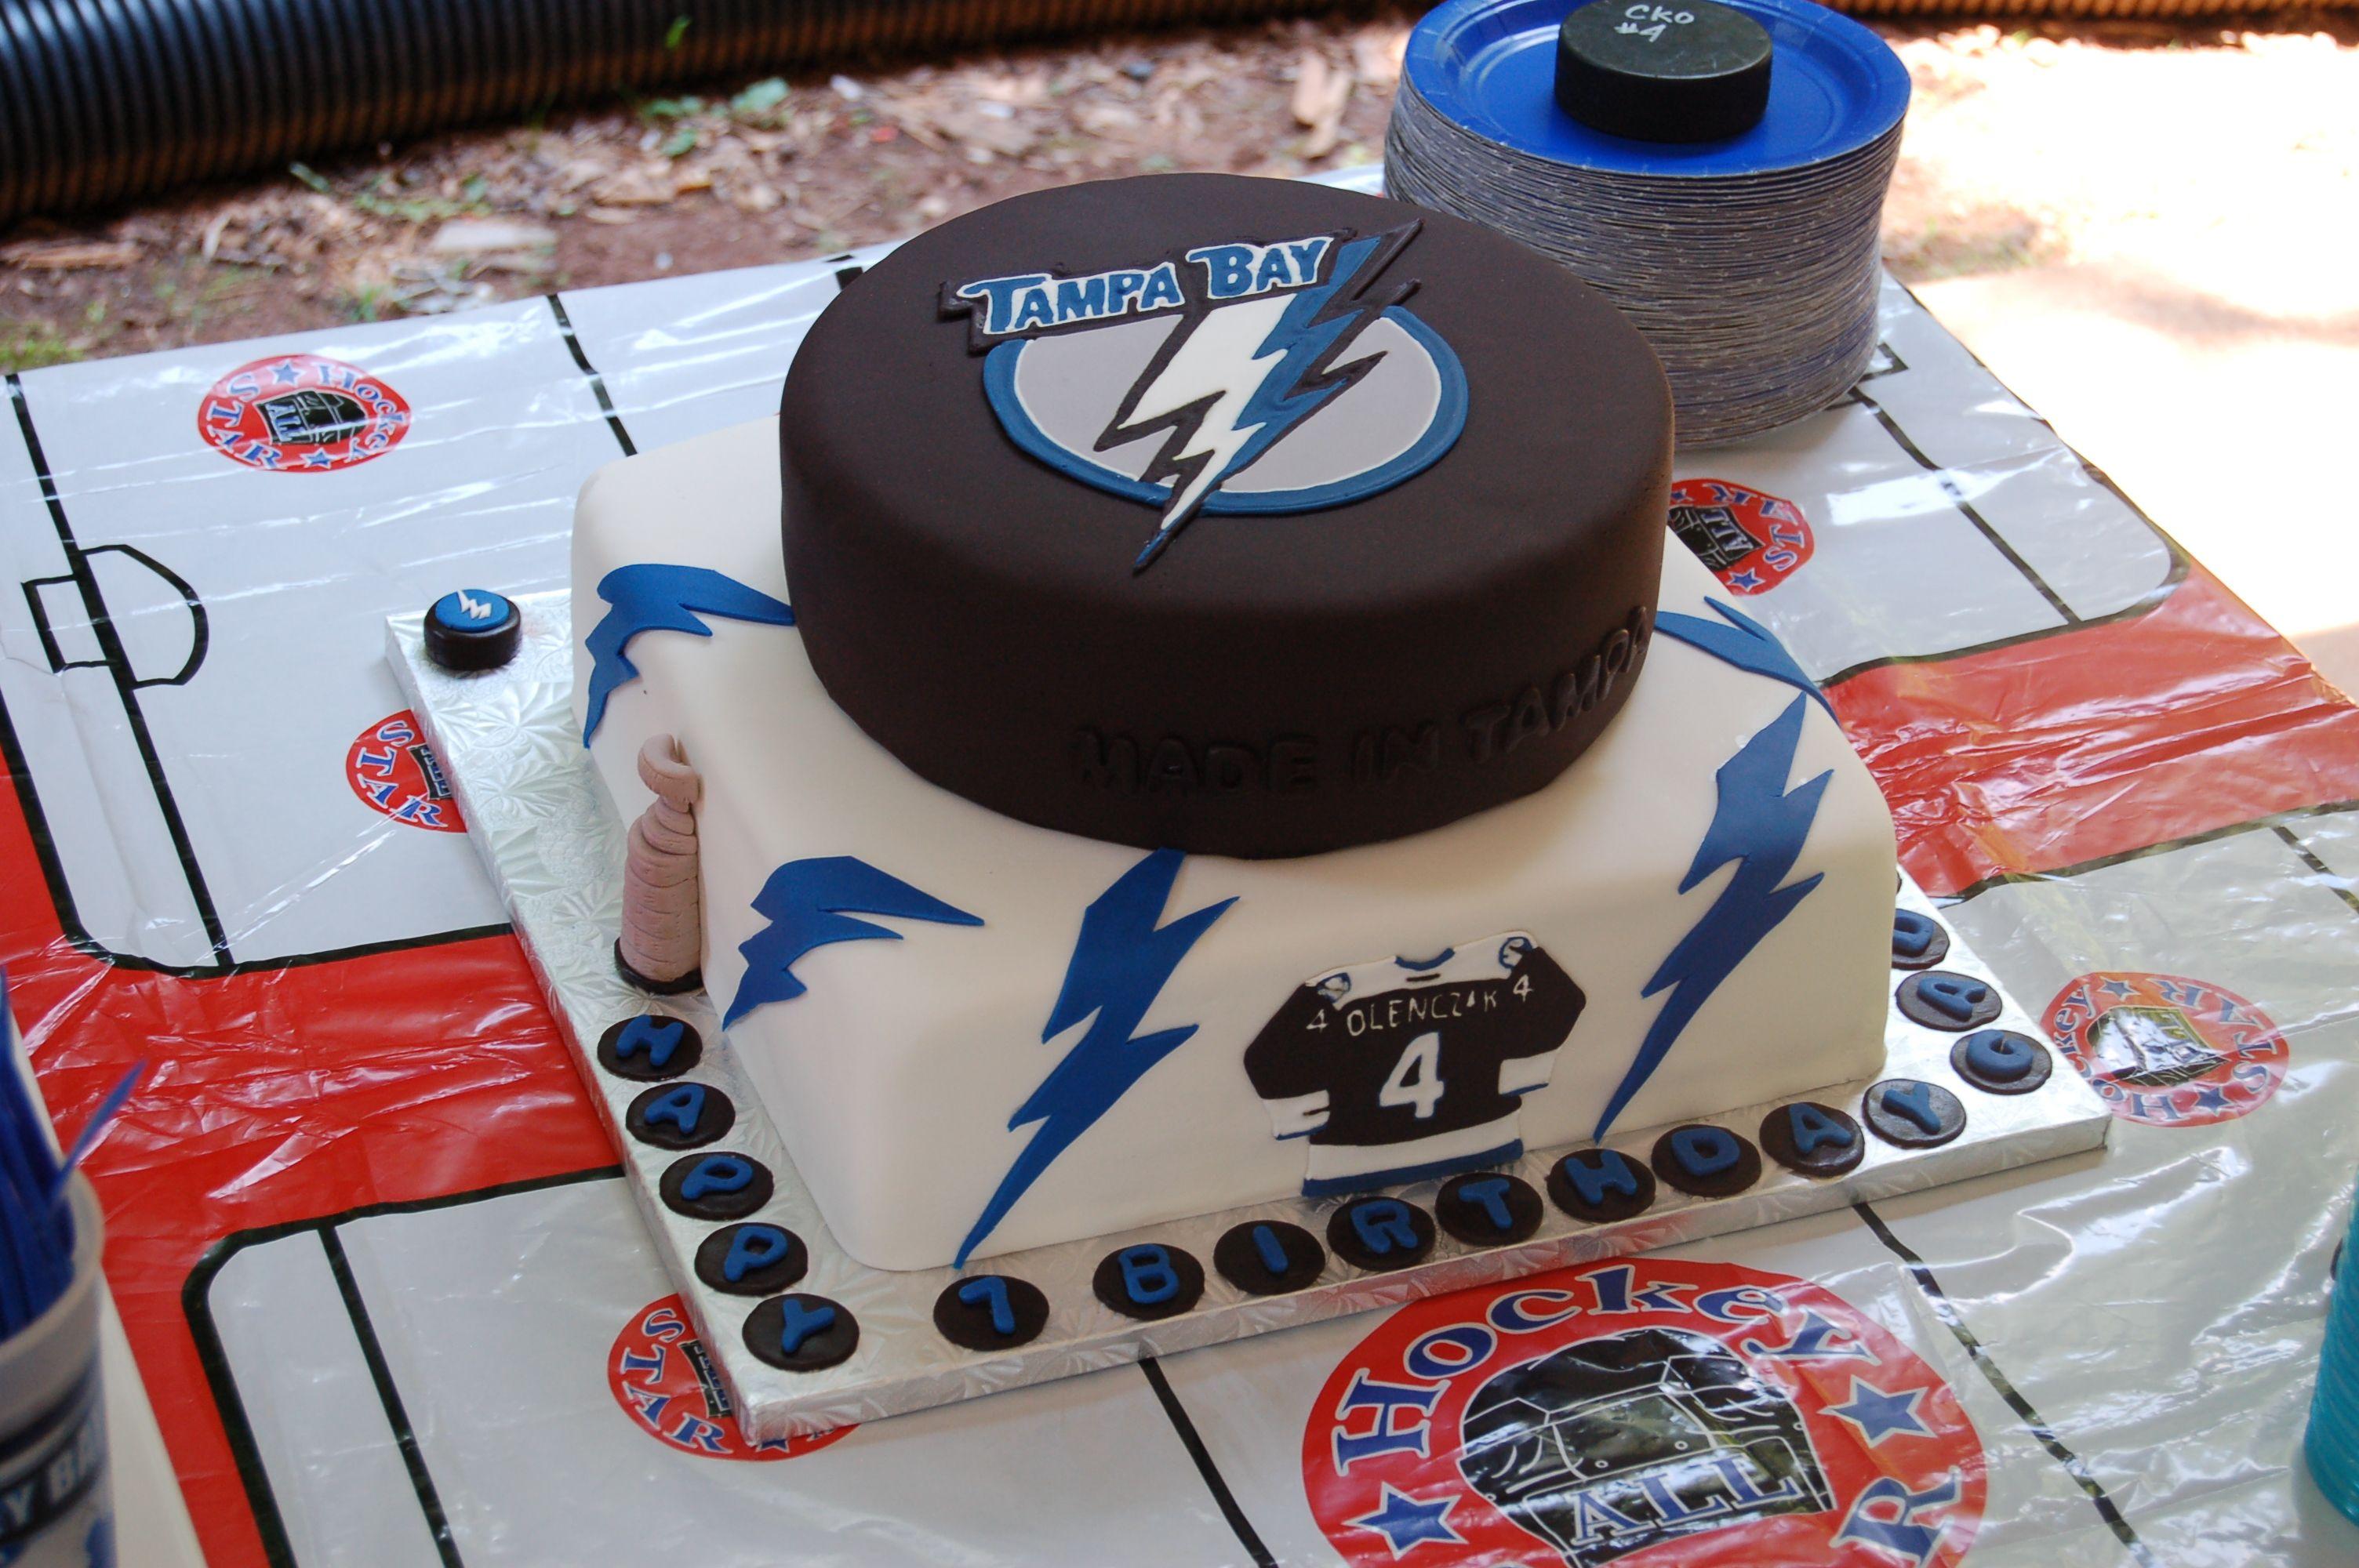 Tampa Bay Lightning Cake I Made For My Sons Birthday